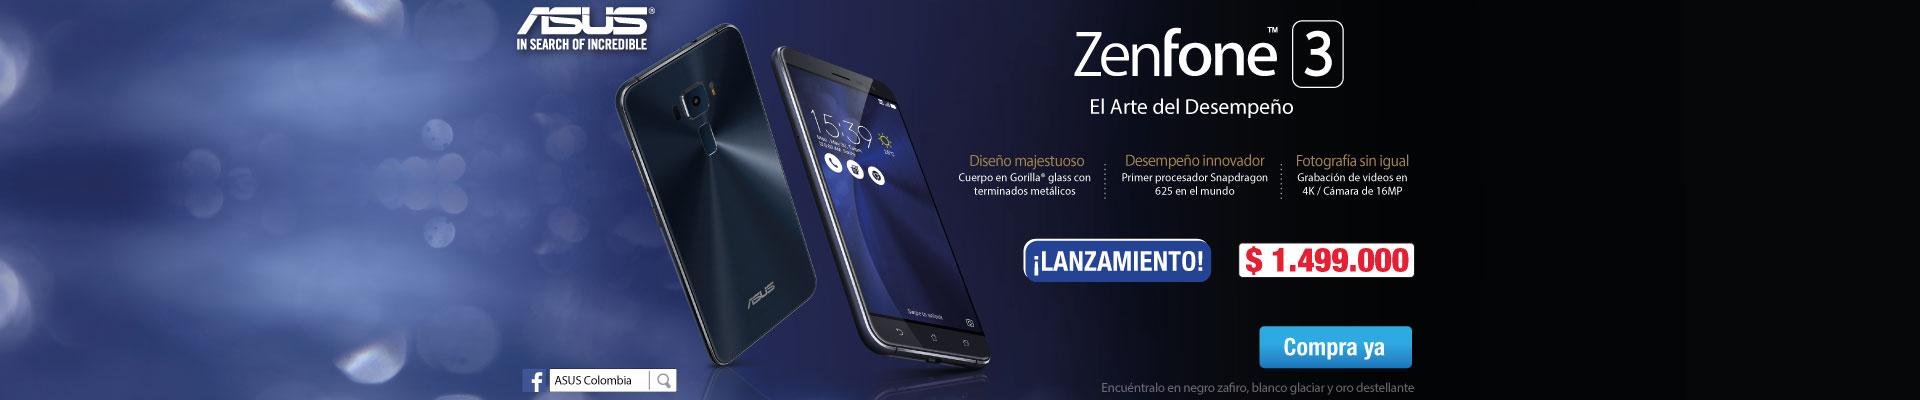 Celular Asus Zenfone 3 Ktx Ppla - Pauta Novi 30